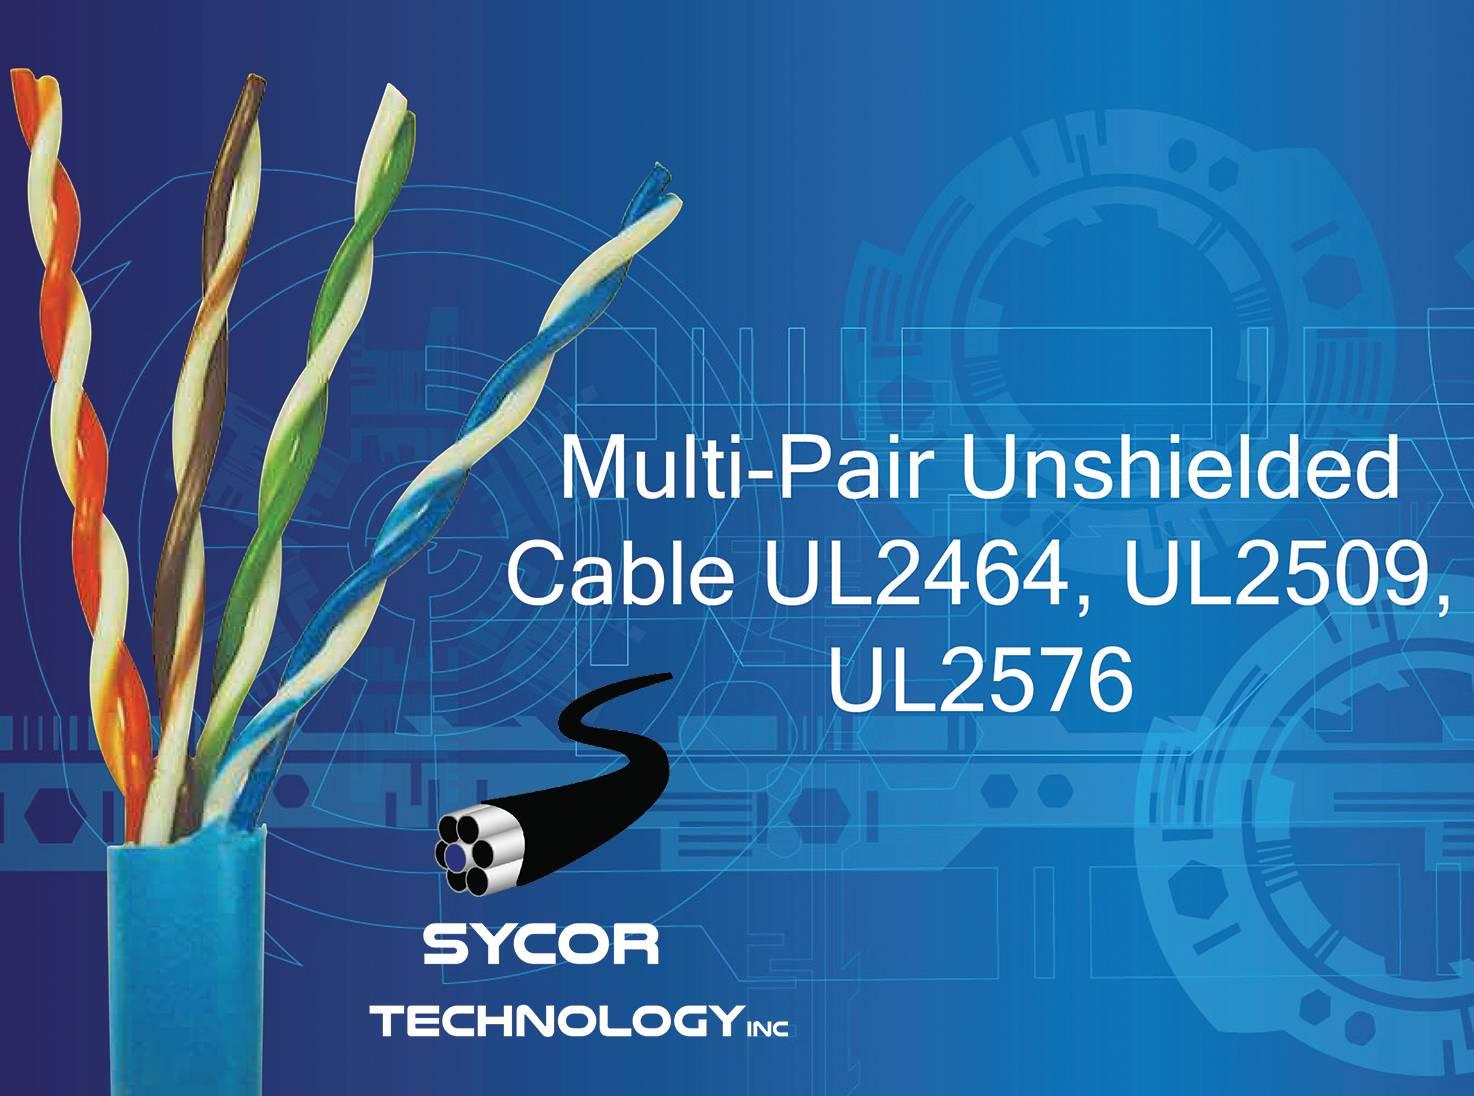 Multi-Pair Unshielded Cable UL2464, UL2509, UL2576